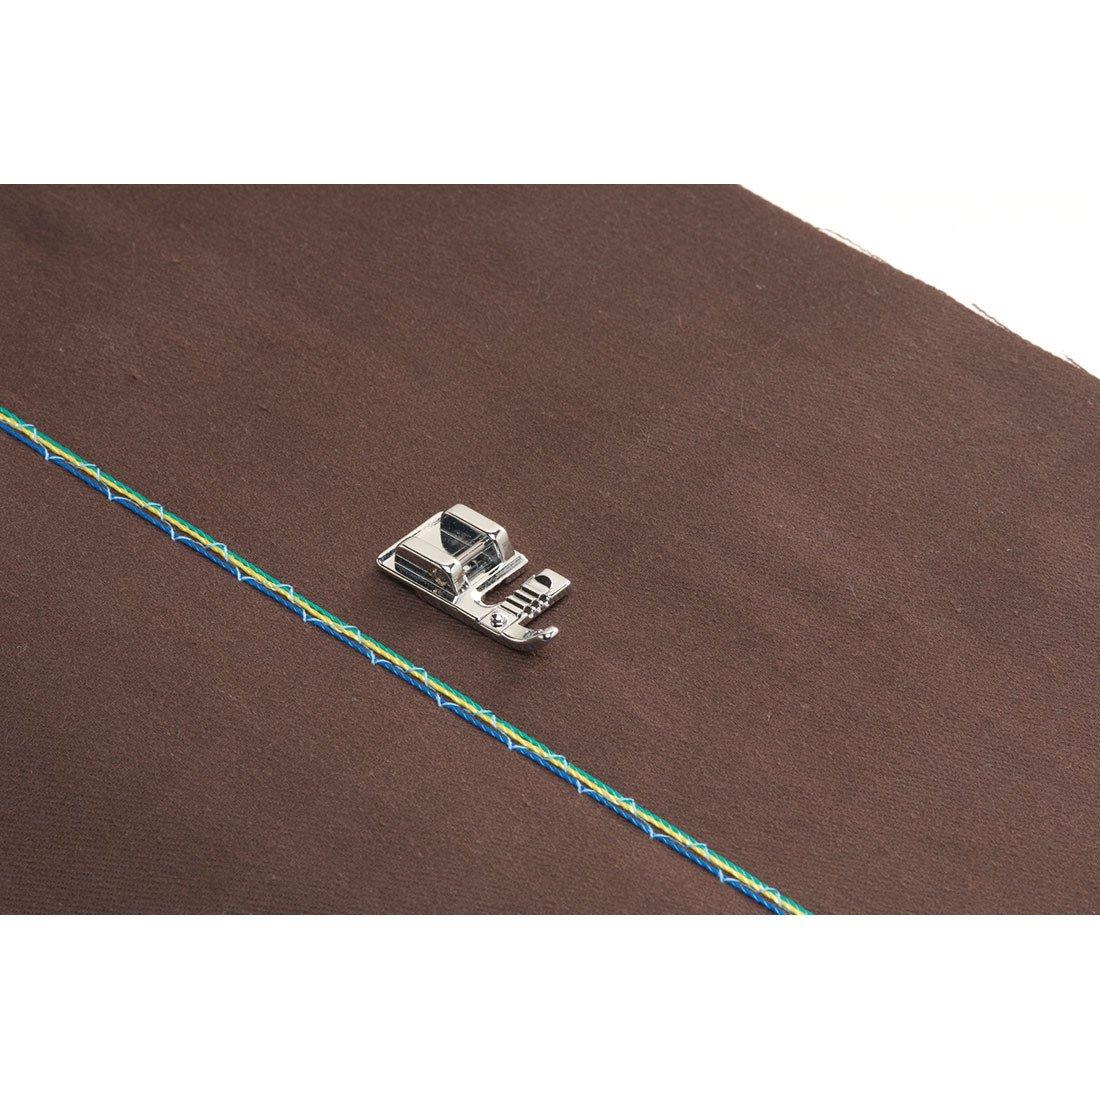 Baby Lock Cording Foot-3 Cord